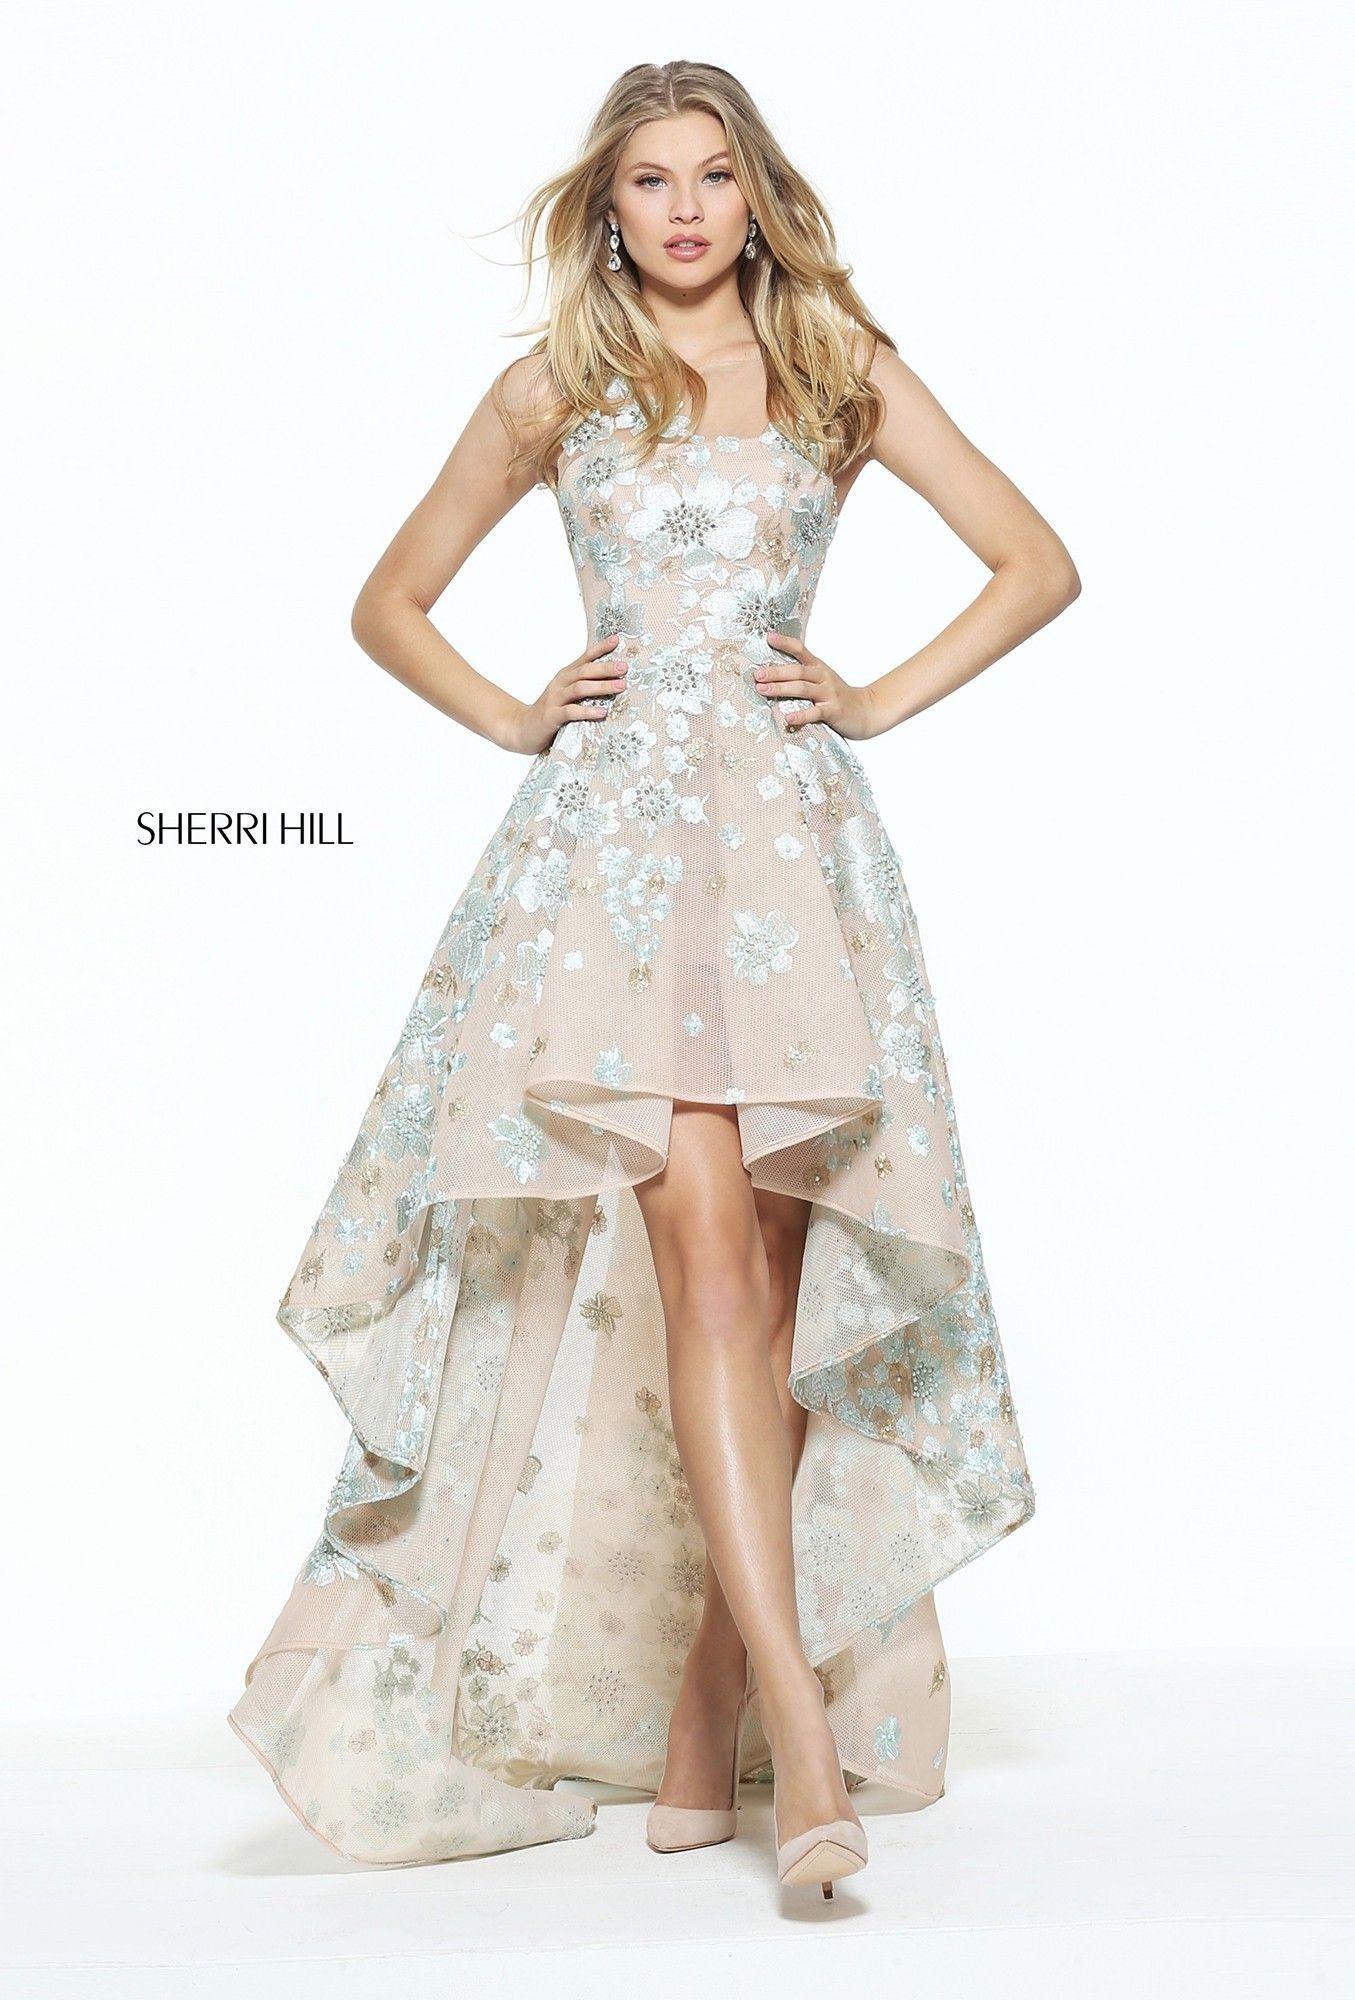 Sherri hill aqua floral nude hilo dress pinterest